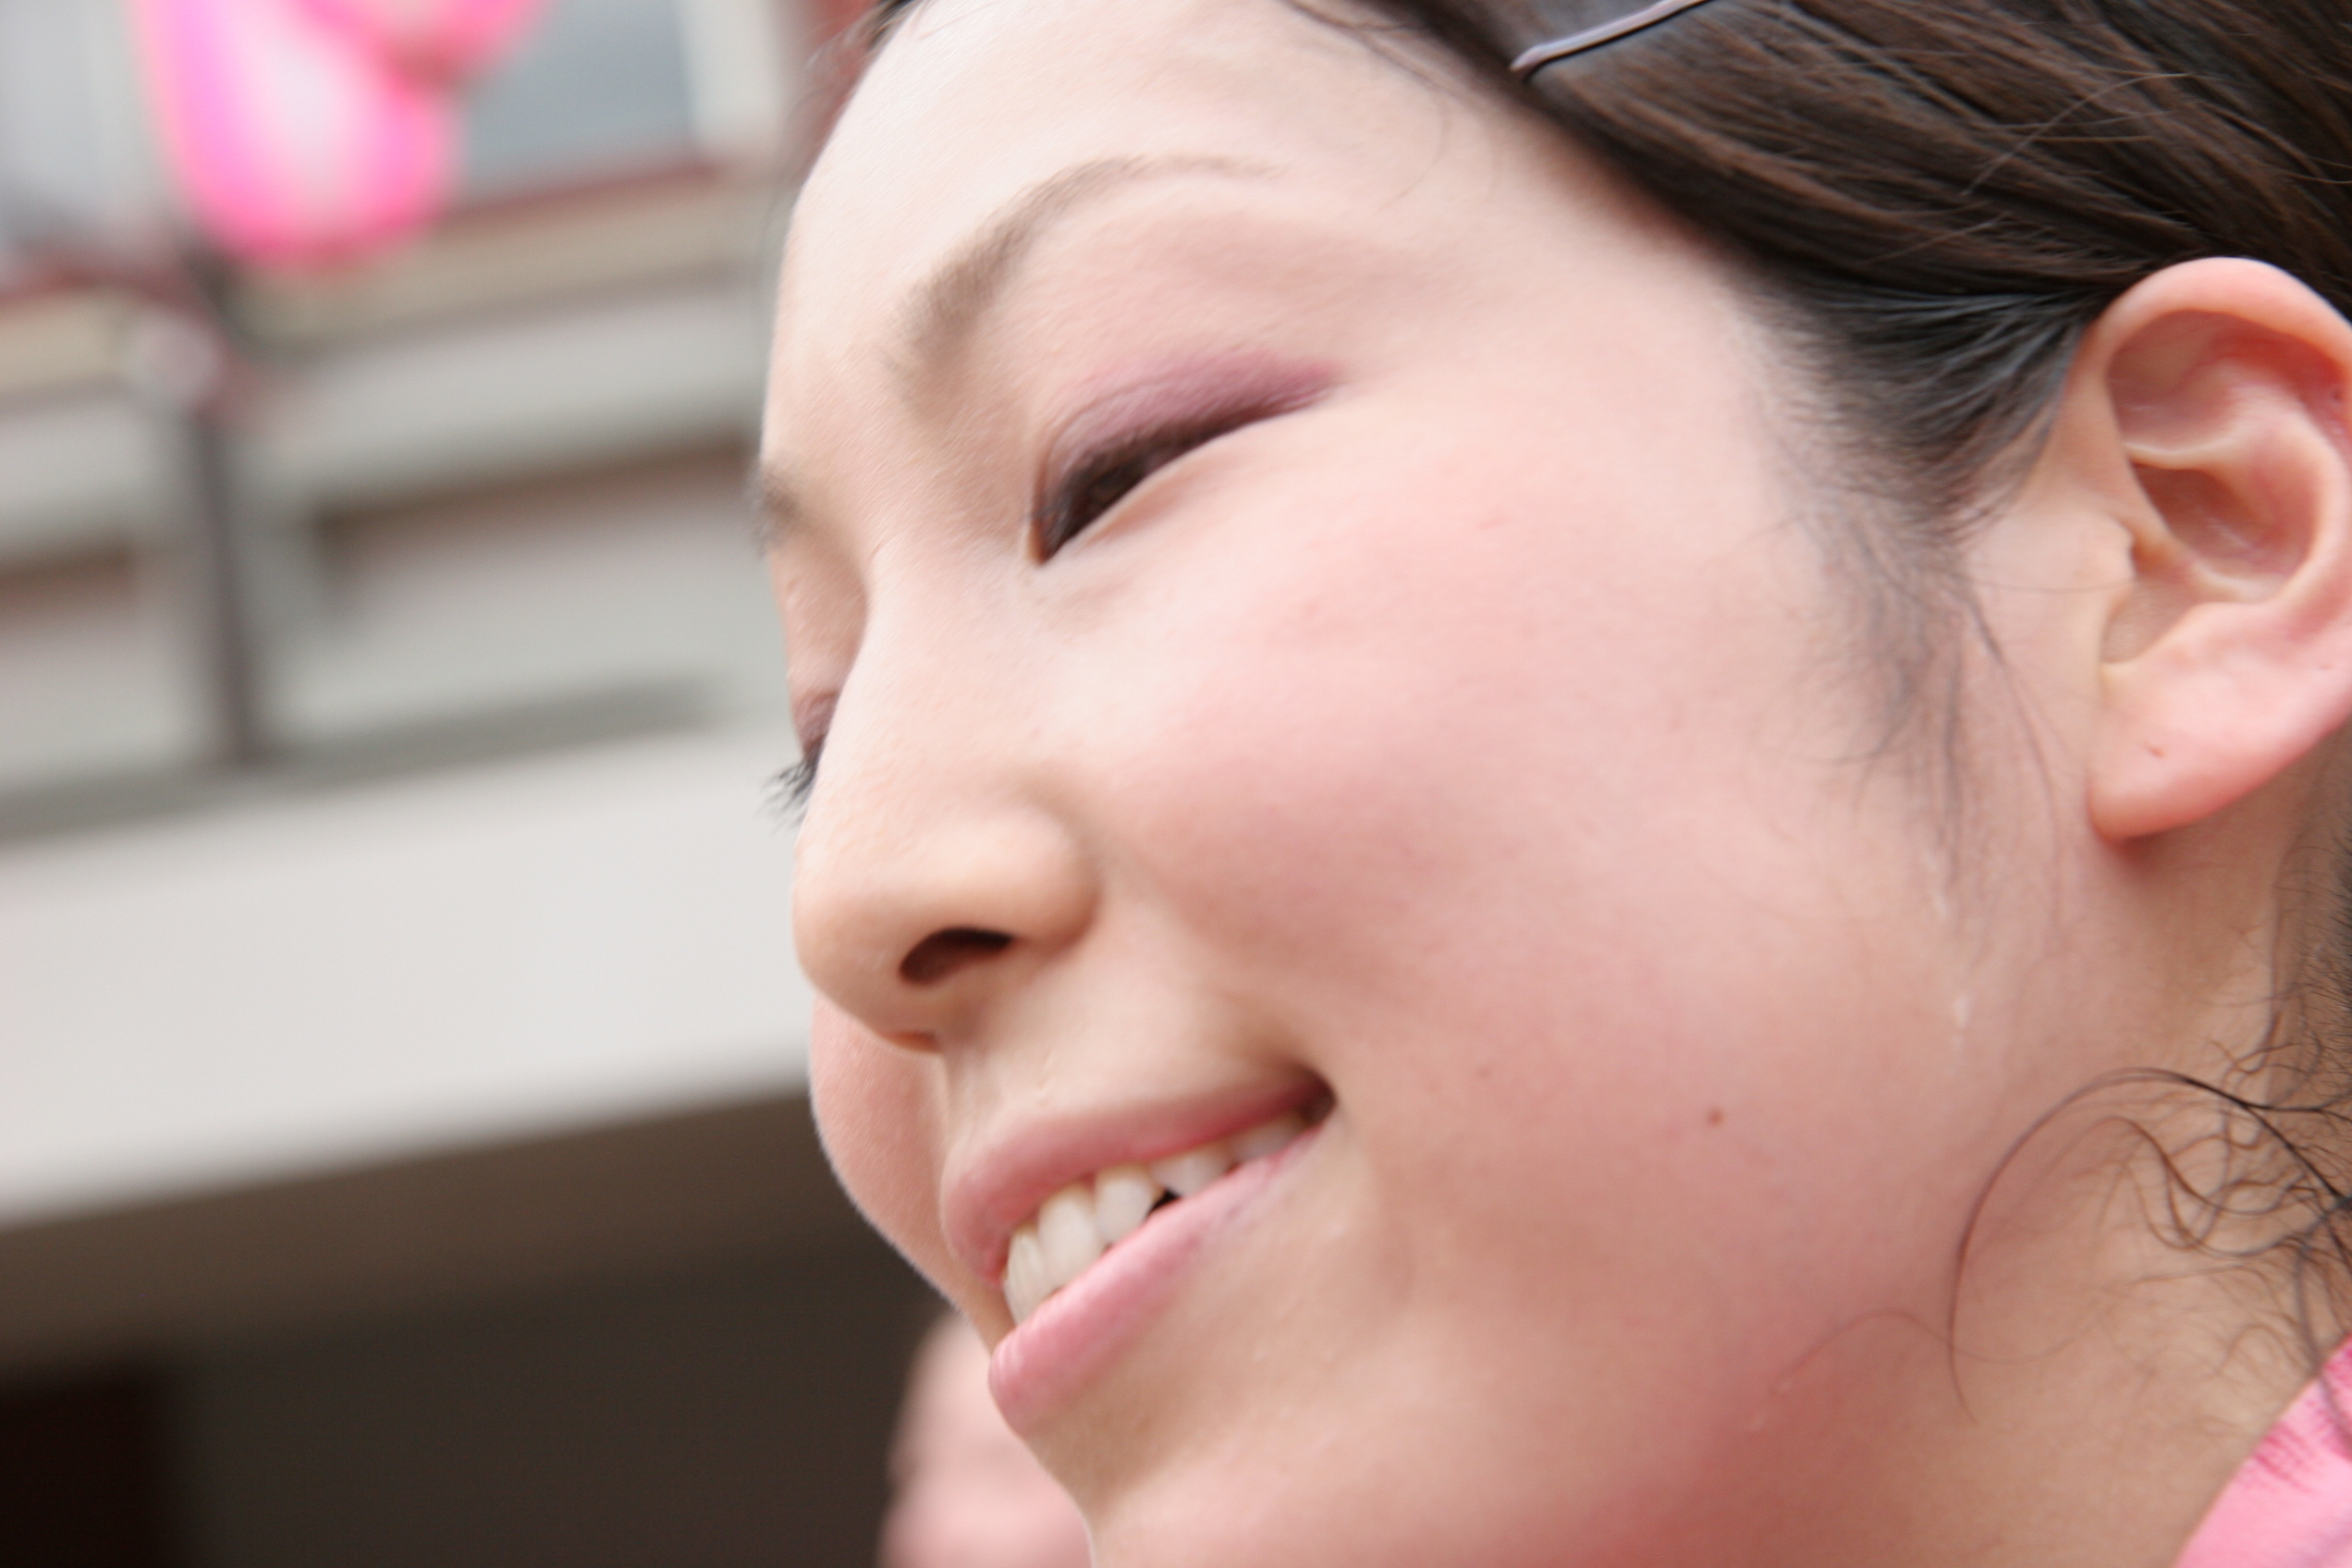 IMG_001241.jpg